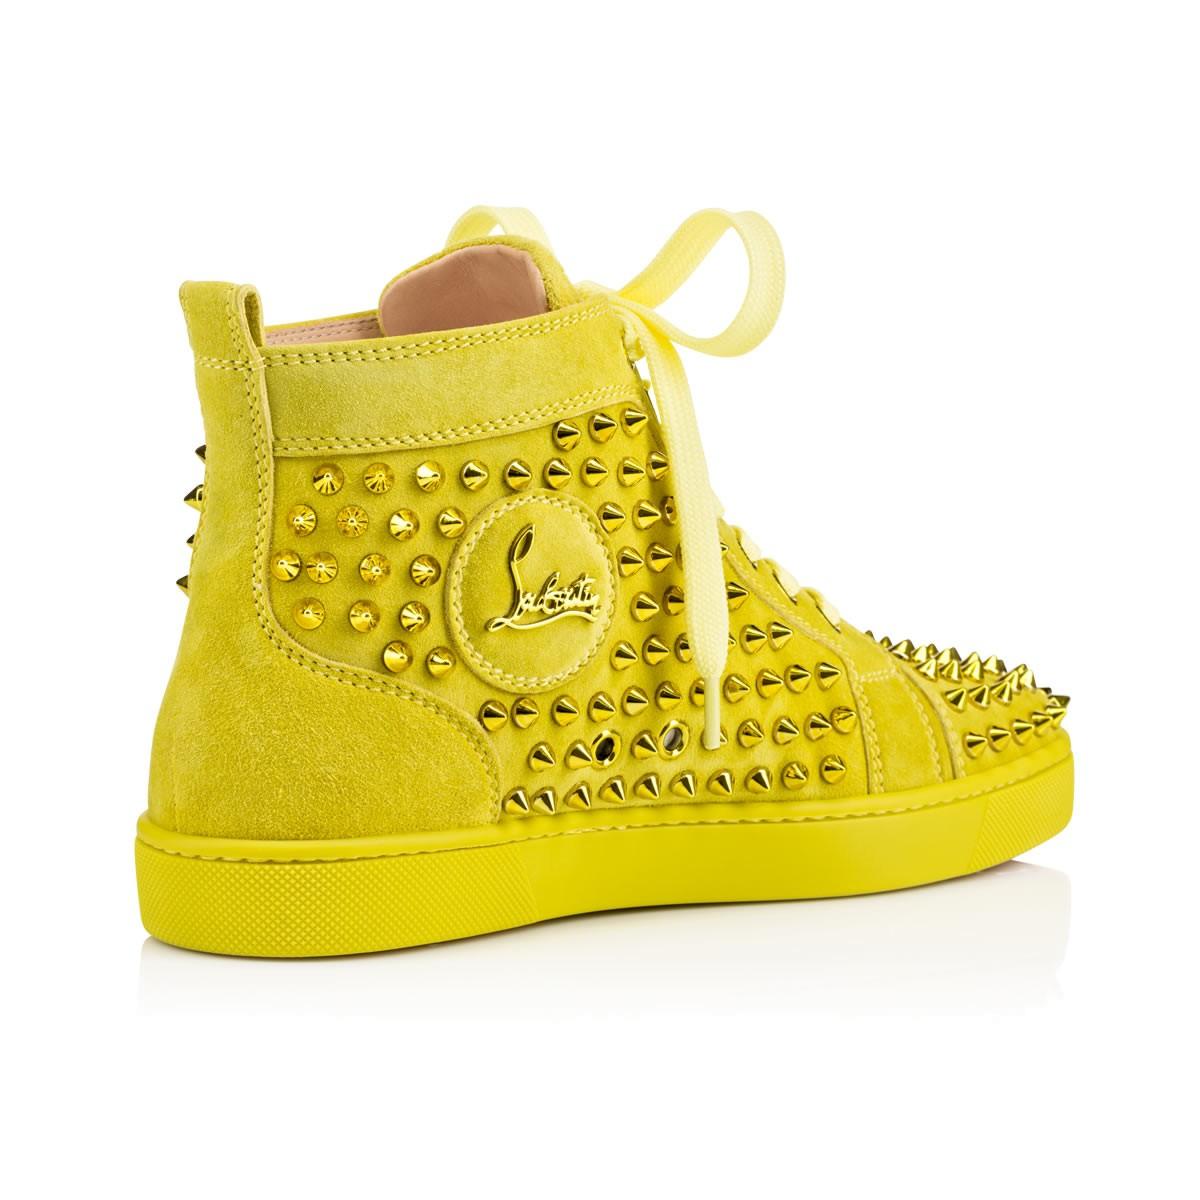 Lyst - Christian Louboutin Louis Spikes Women S Flat in Yellow 7d6605d30